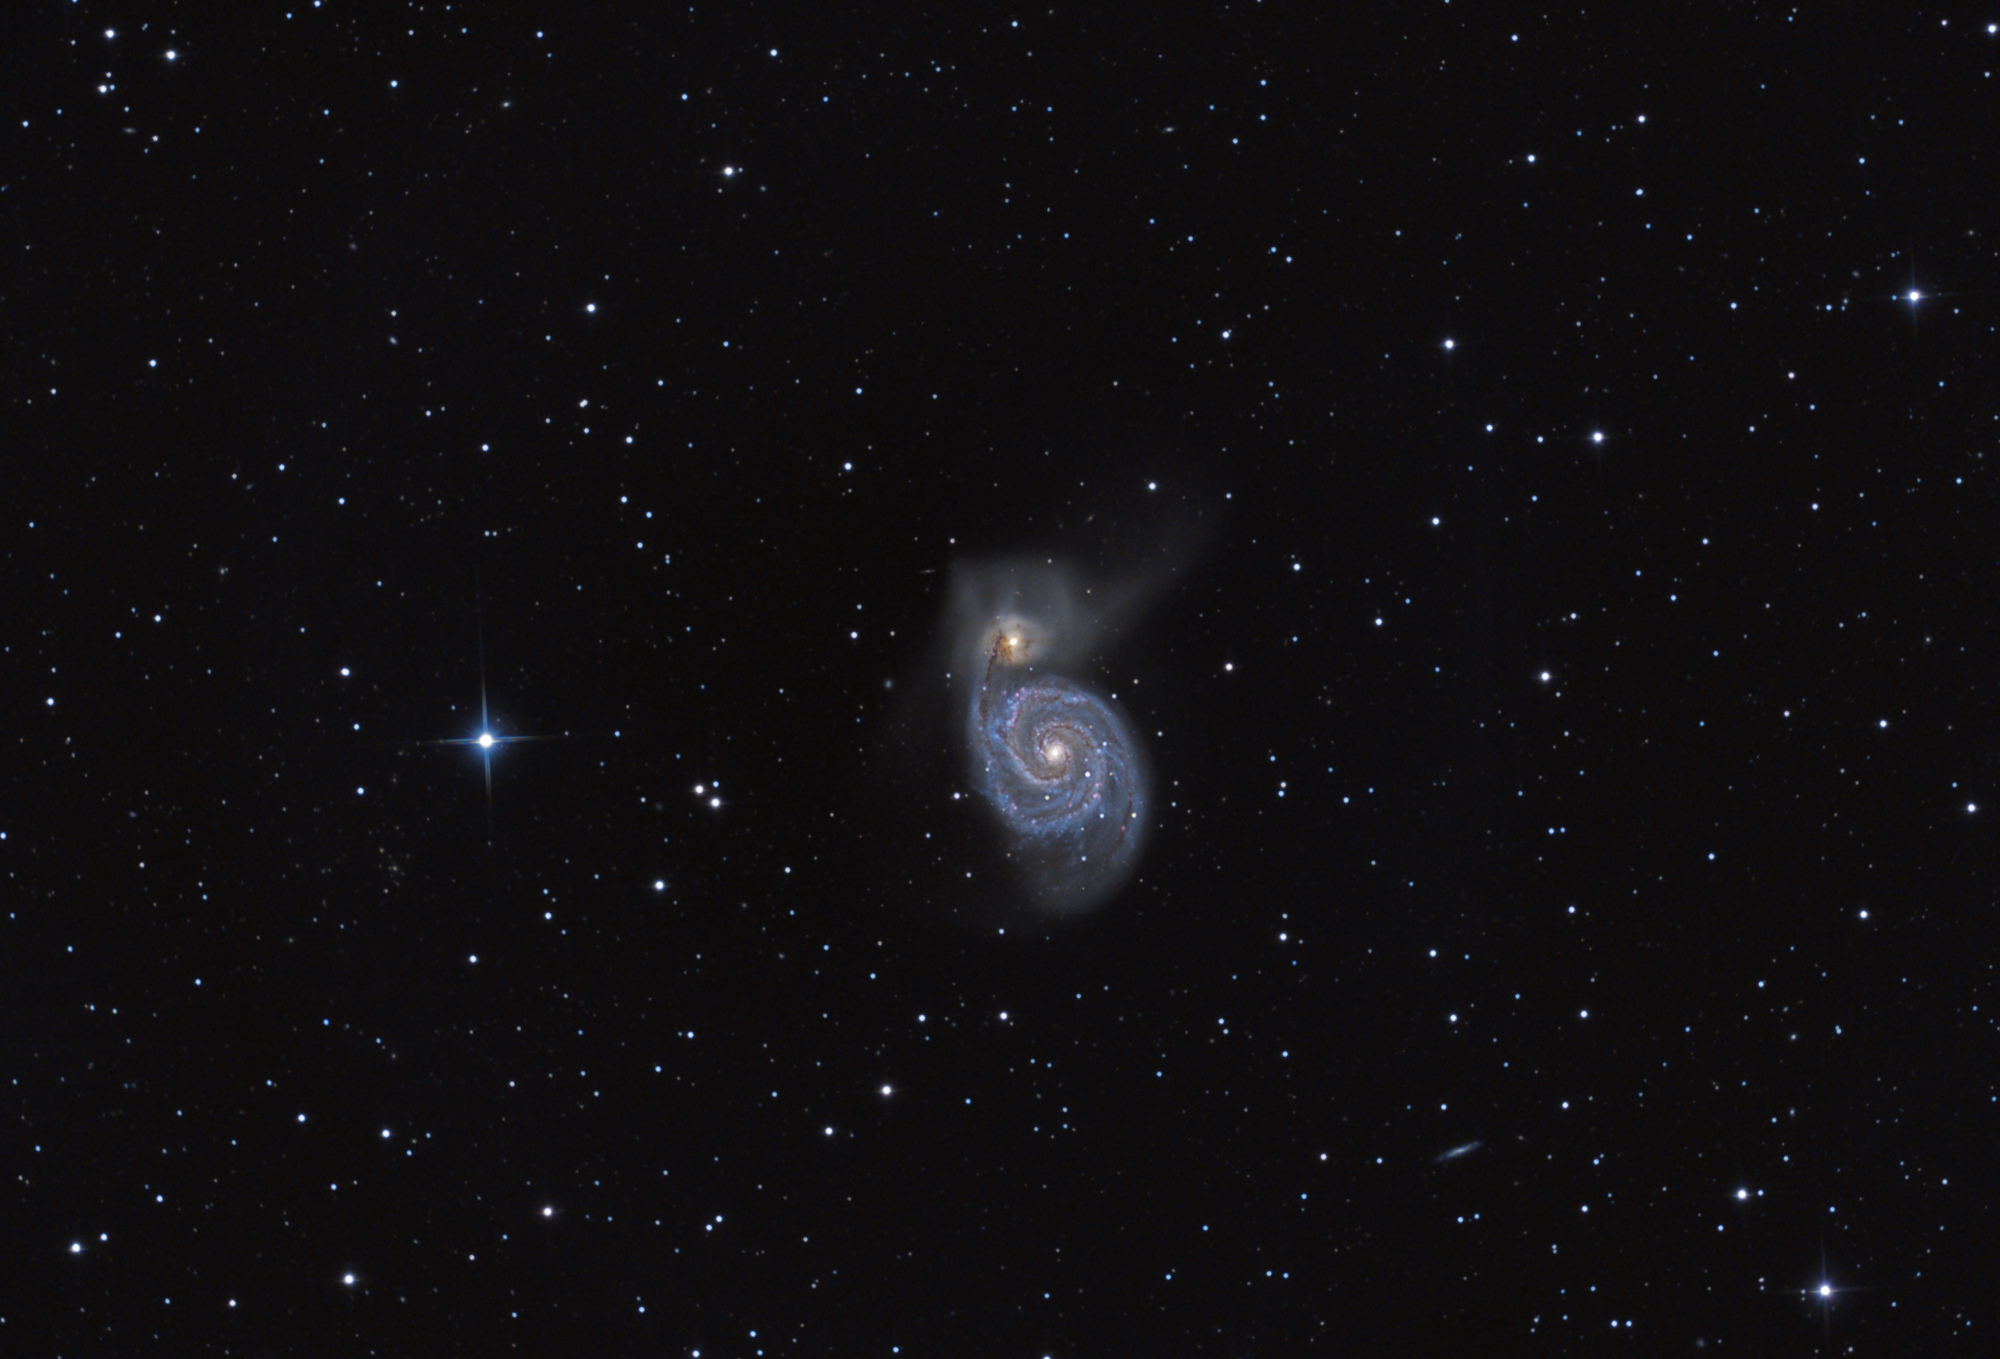 M51_DSS_SiriL_PSD_color2.jpg